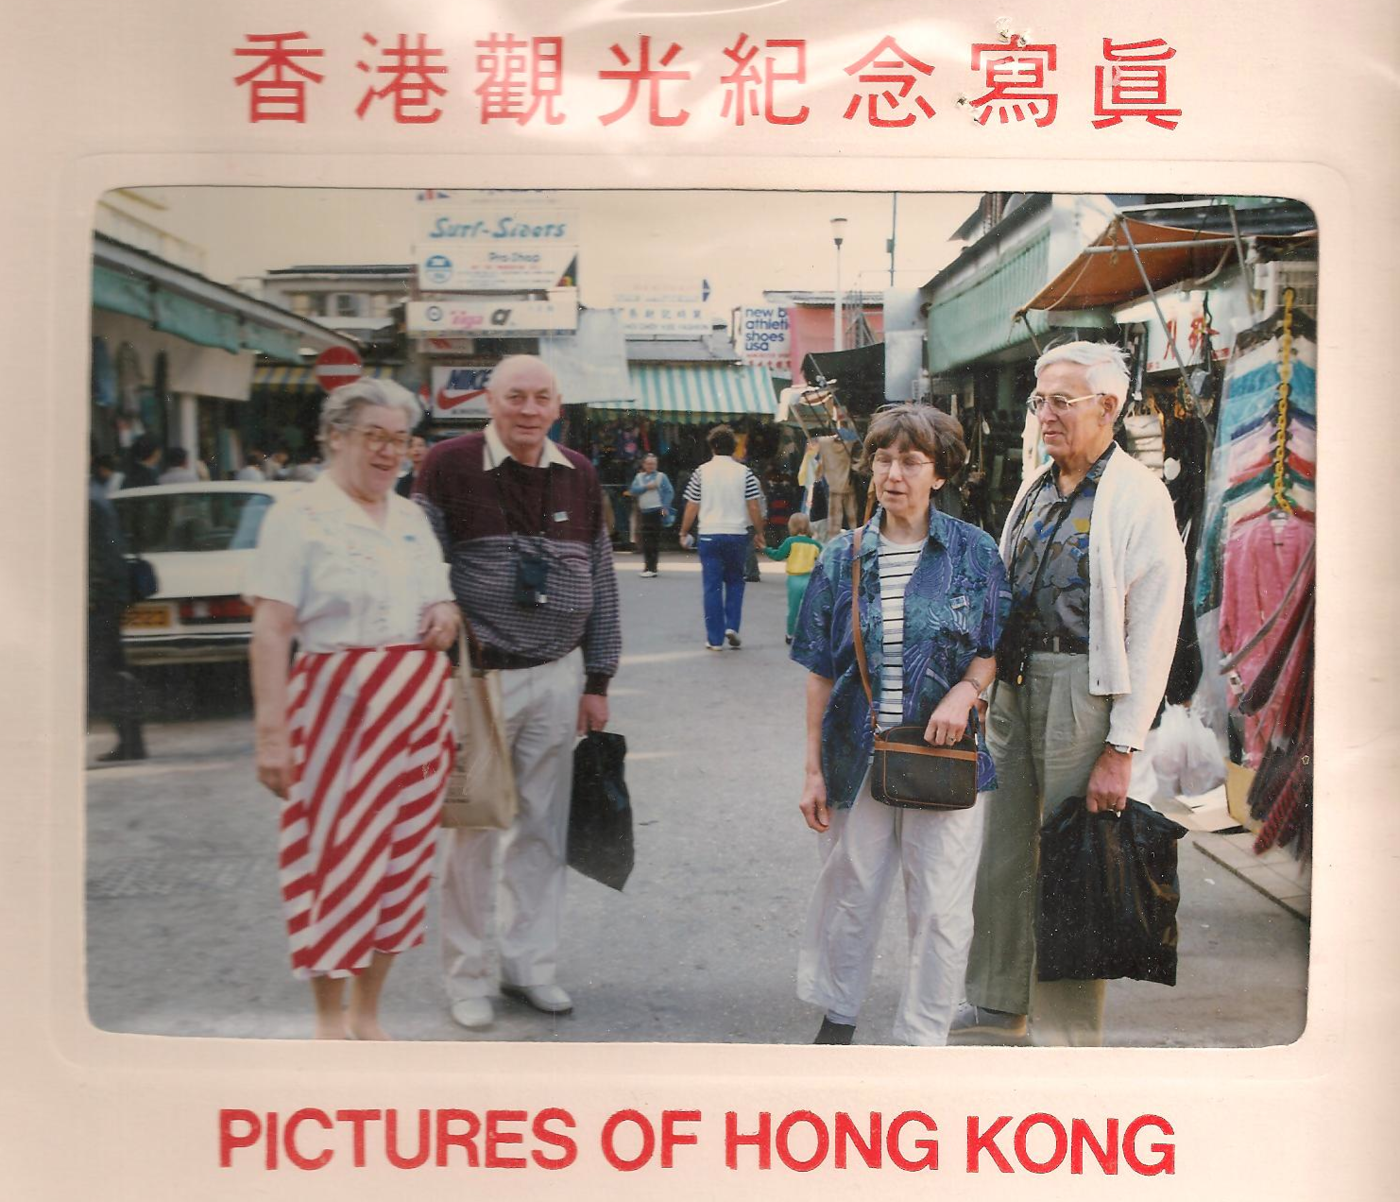 Mummi_pappa_Hongkong1988.jpg.png